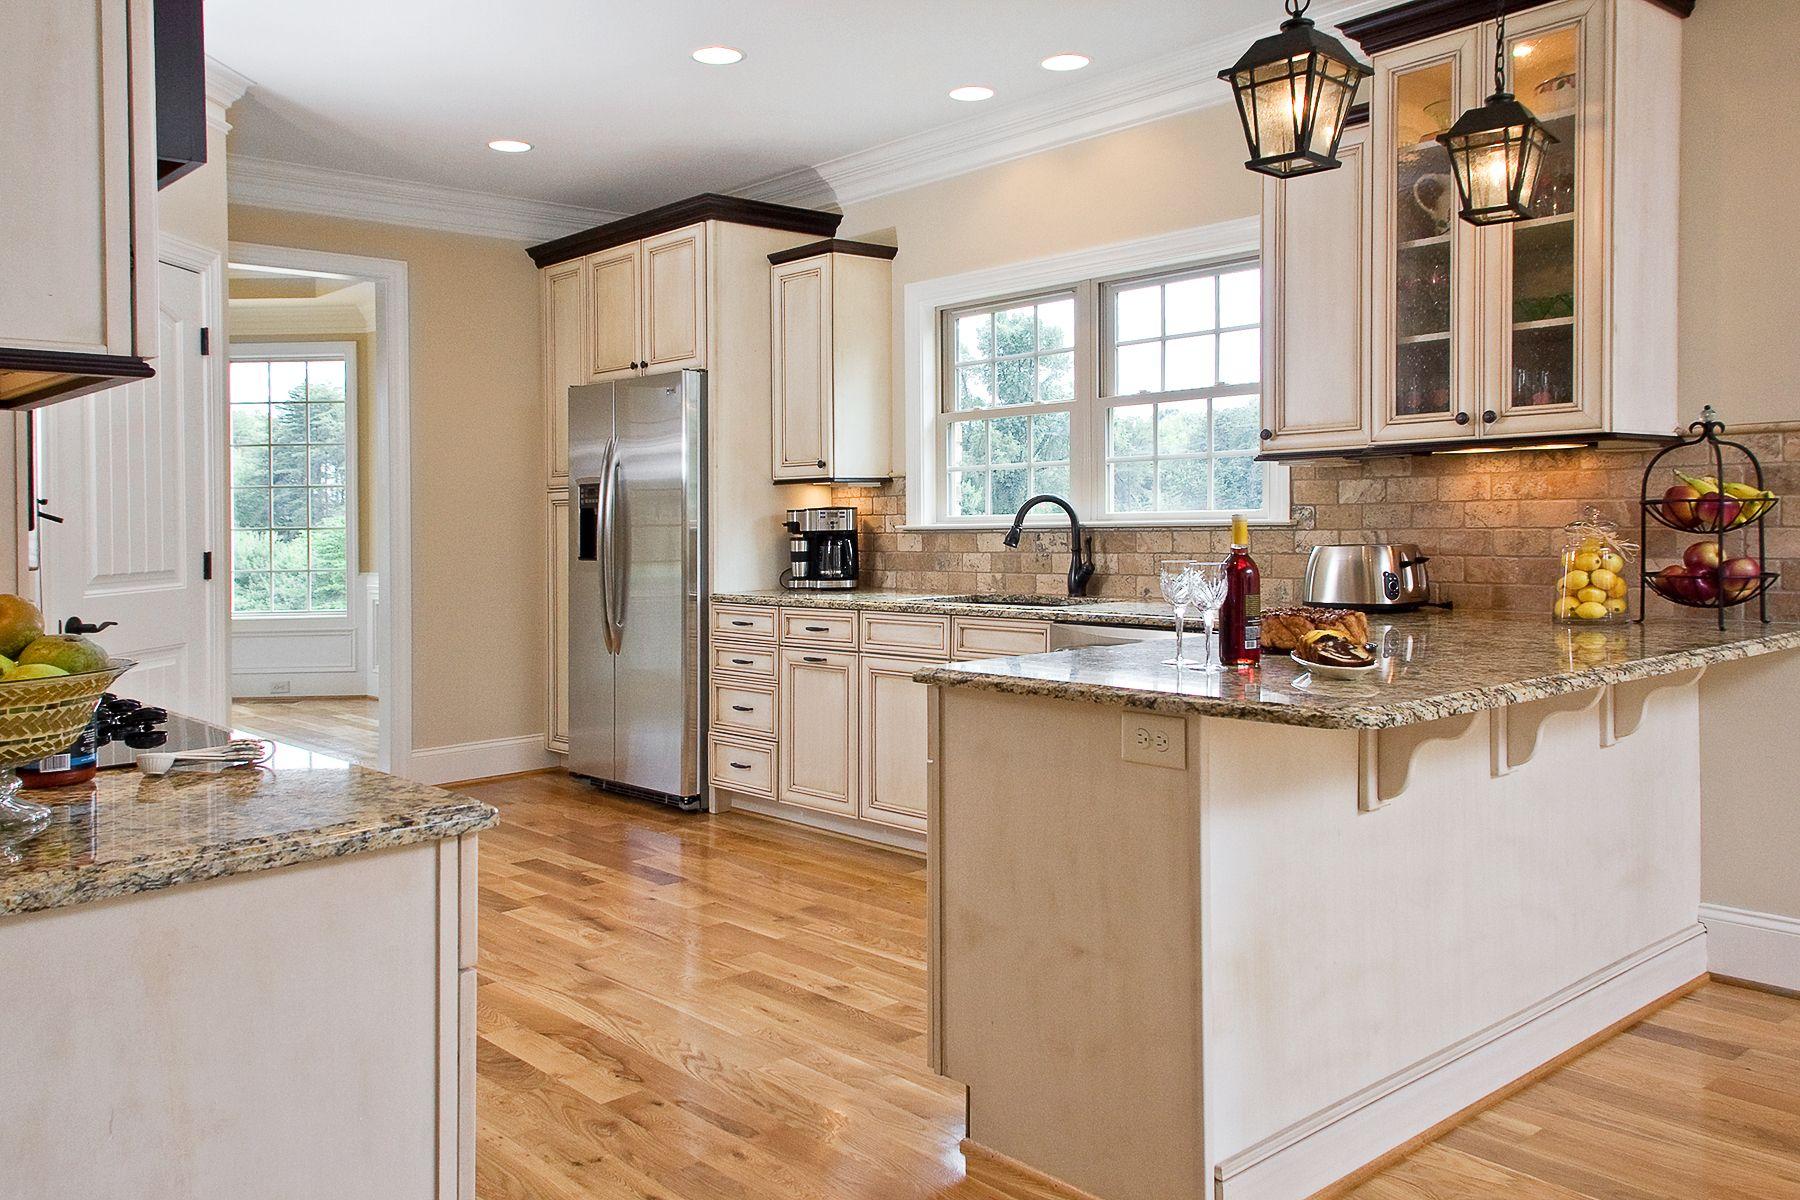 New kitchen kitchen design newconstruction New